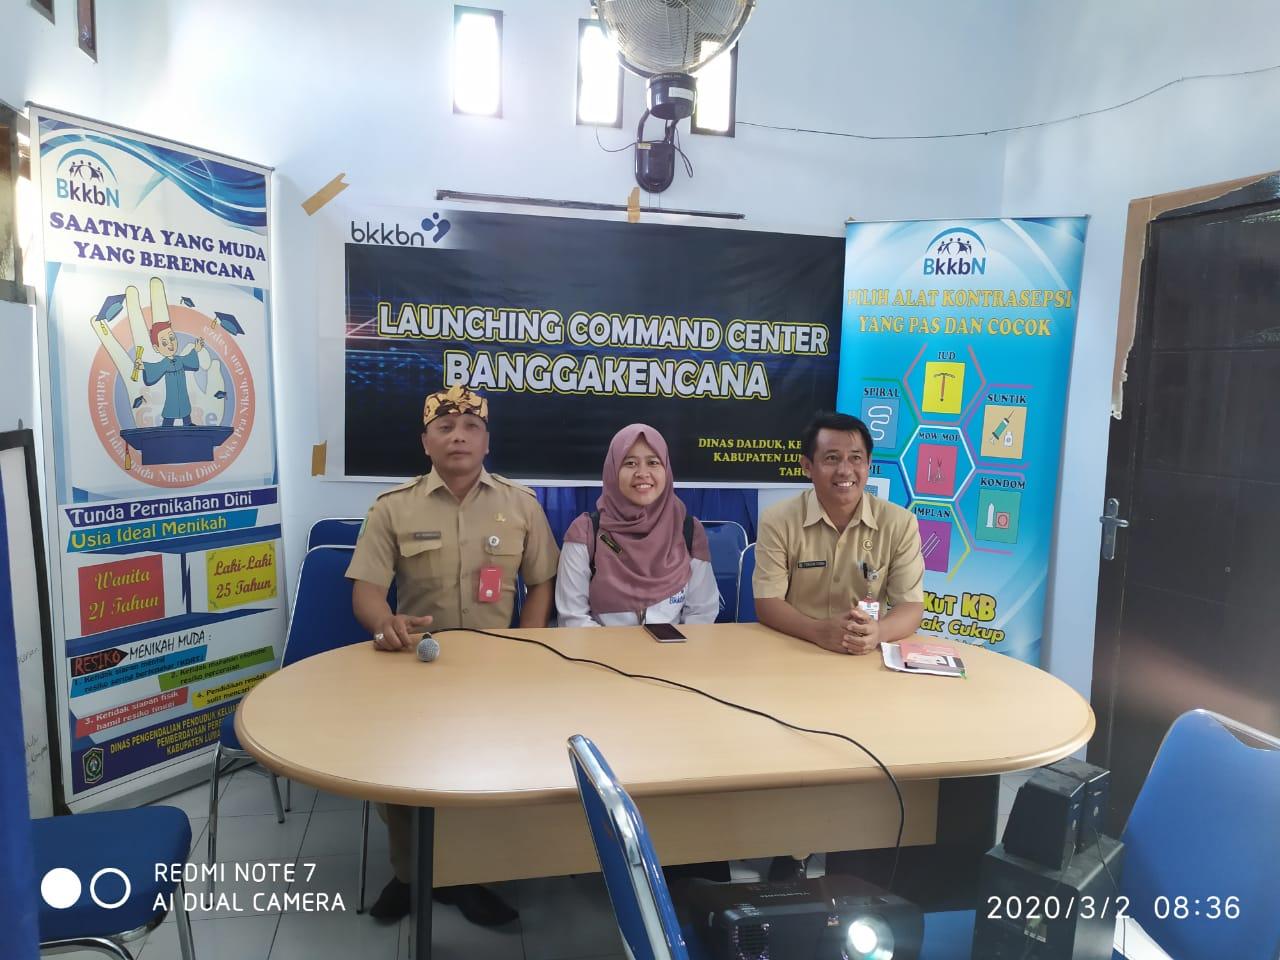 Launching Command Center BANGGAKENCANA